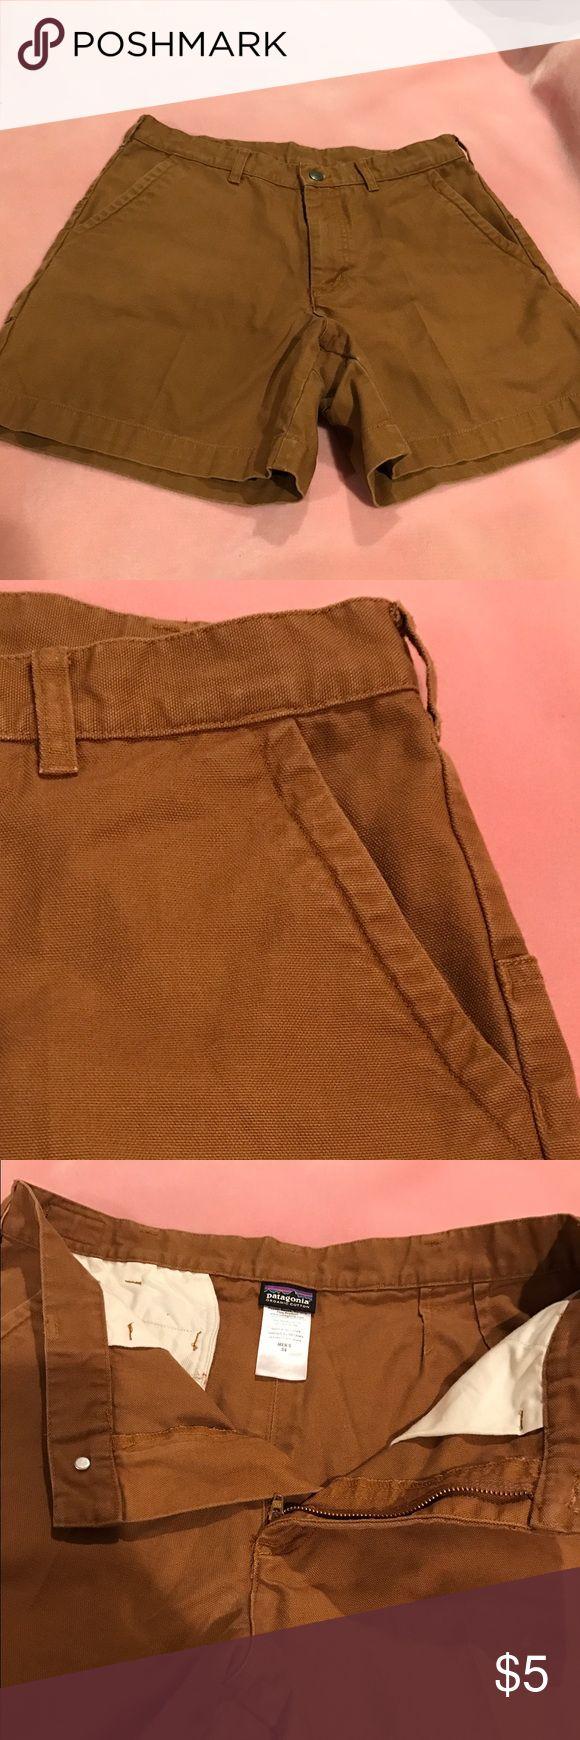 "Patagonia Men's Shorts 34 waist. 6"" inseam. Rust. Patagonia Men's Shorts. 34"" waist. 6"" inseam. Color:  Rusted Iron. Beautiful color. Patagonia Shorts Flat Front"